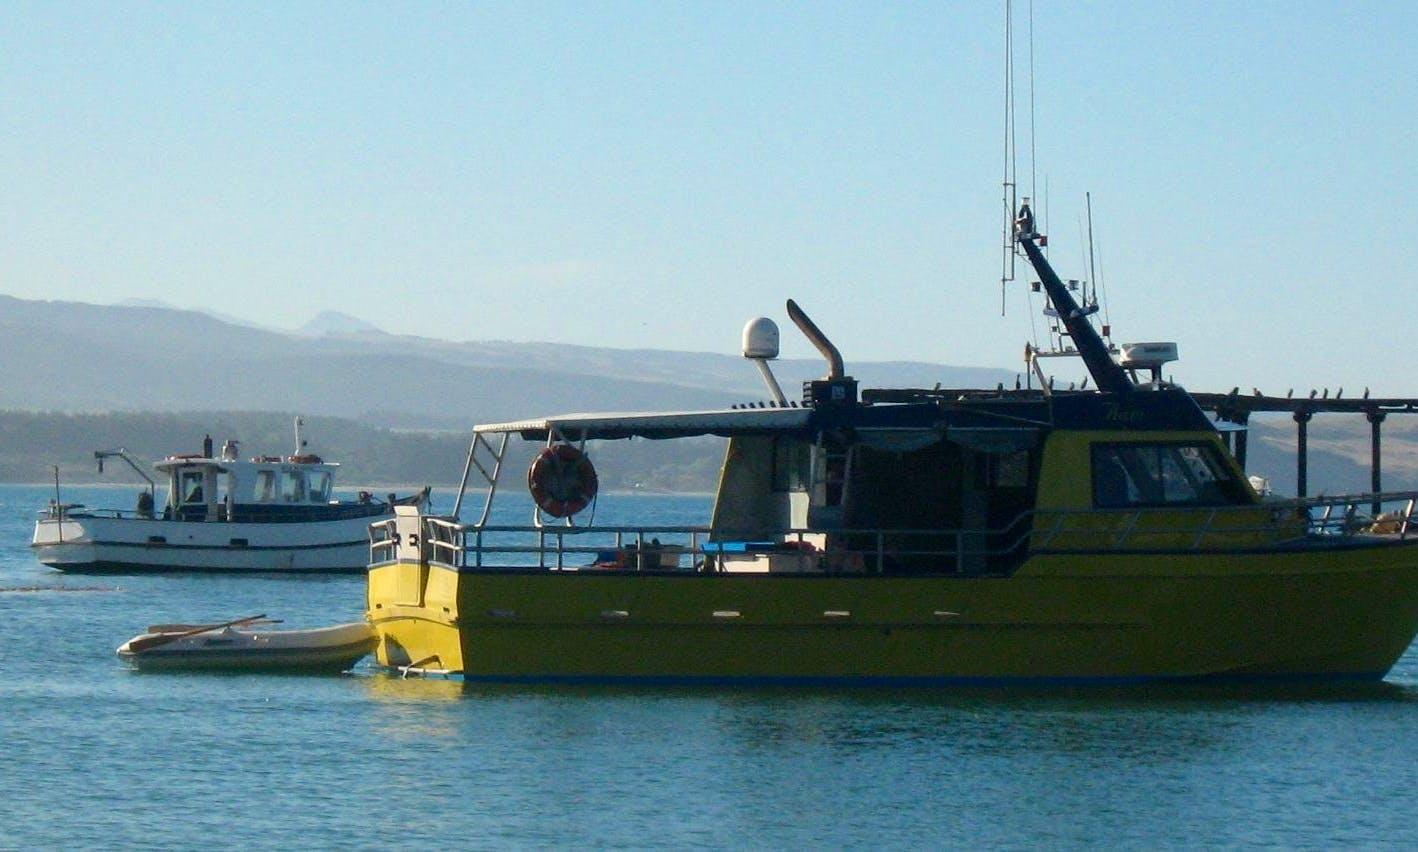 Fishing Charter in Moeraki